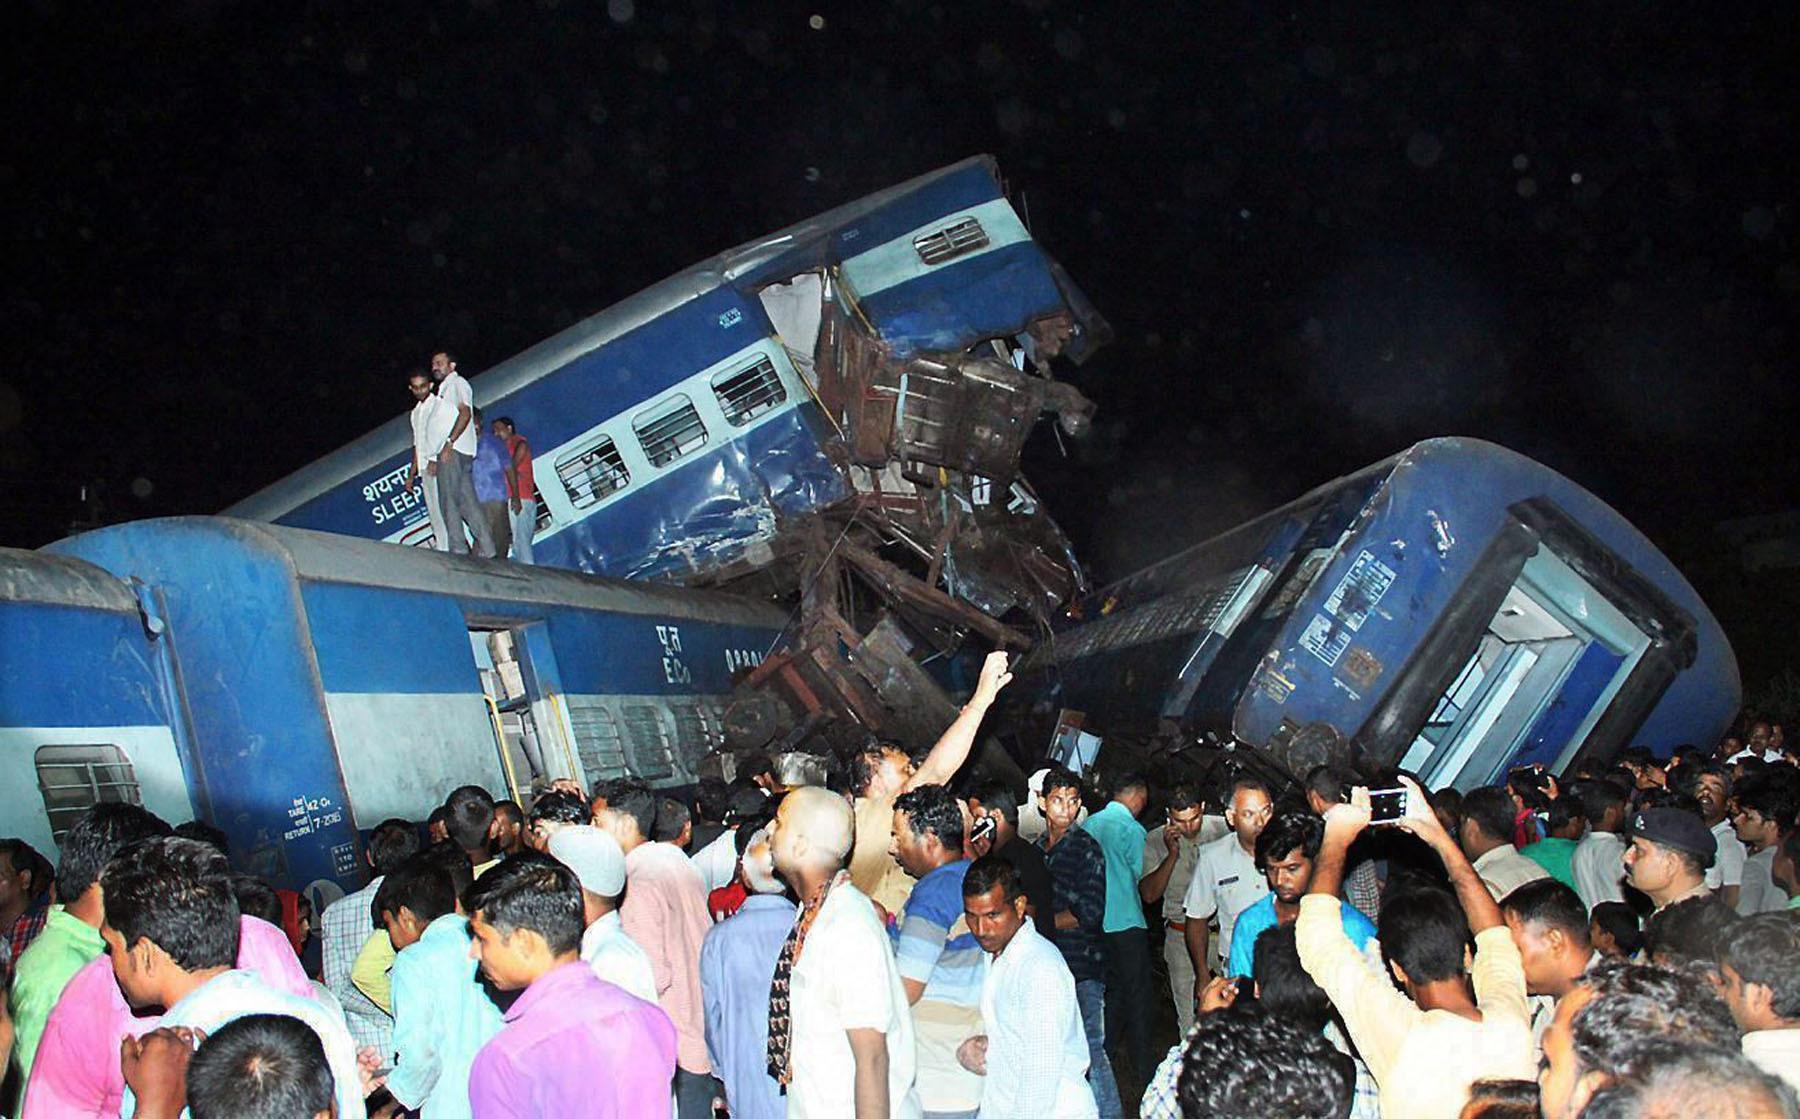 Muzaffarnagar: Coaches of the Puri-Haridwar Utkal Express train after it derailed in Khatauli near Muzaffarnagar on Saturday. At least four were killed and 15 to 20 people were said to be injured as per initial reports. PTI Photo (PTI8_19_2017_000159B)